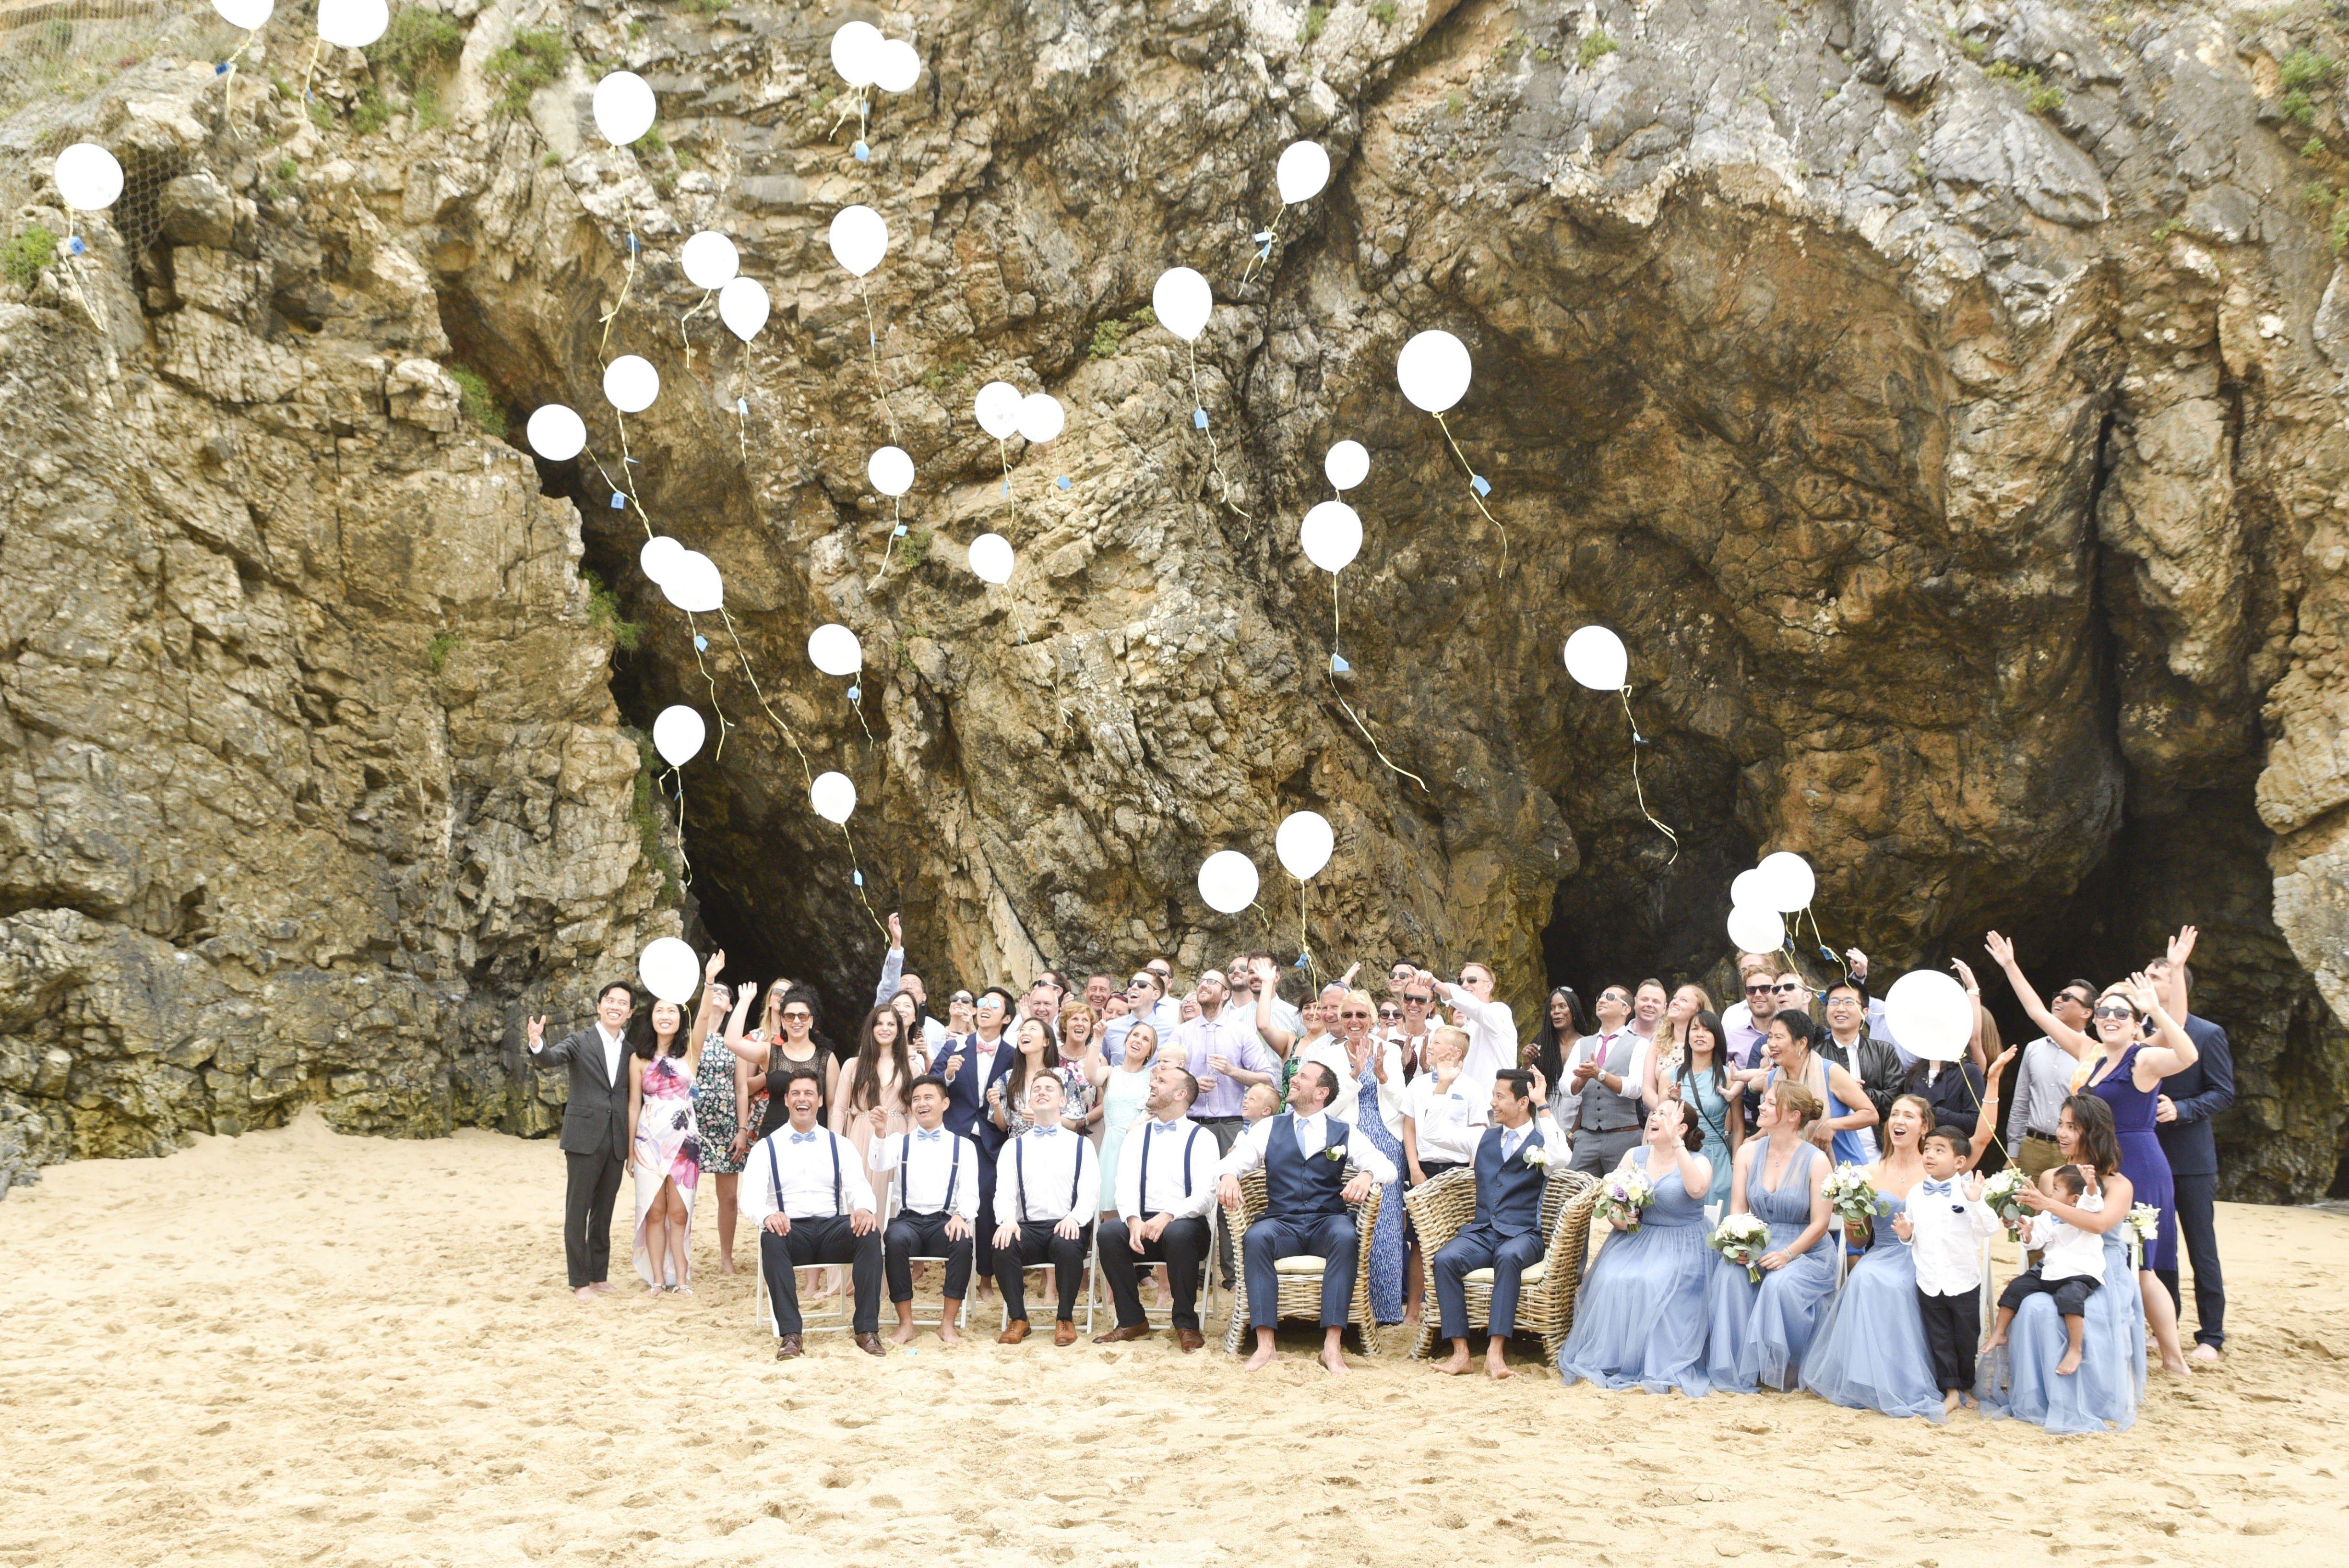 Wedding Balloons - @vweddingportuga #weddinginportugal #vintageweddinginportugal #vintagewedding #portugalwedding #weddingportugal #weddingsinportugal #myvintageweddinginportugal #rusticwedding #rusticweddinginportugal #thequinta #weddinginsintra #beachweddingportugal #portugalbeachwedding